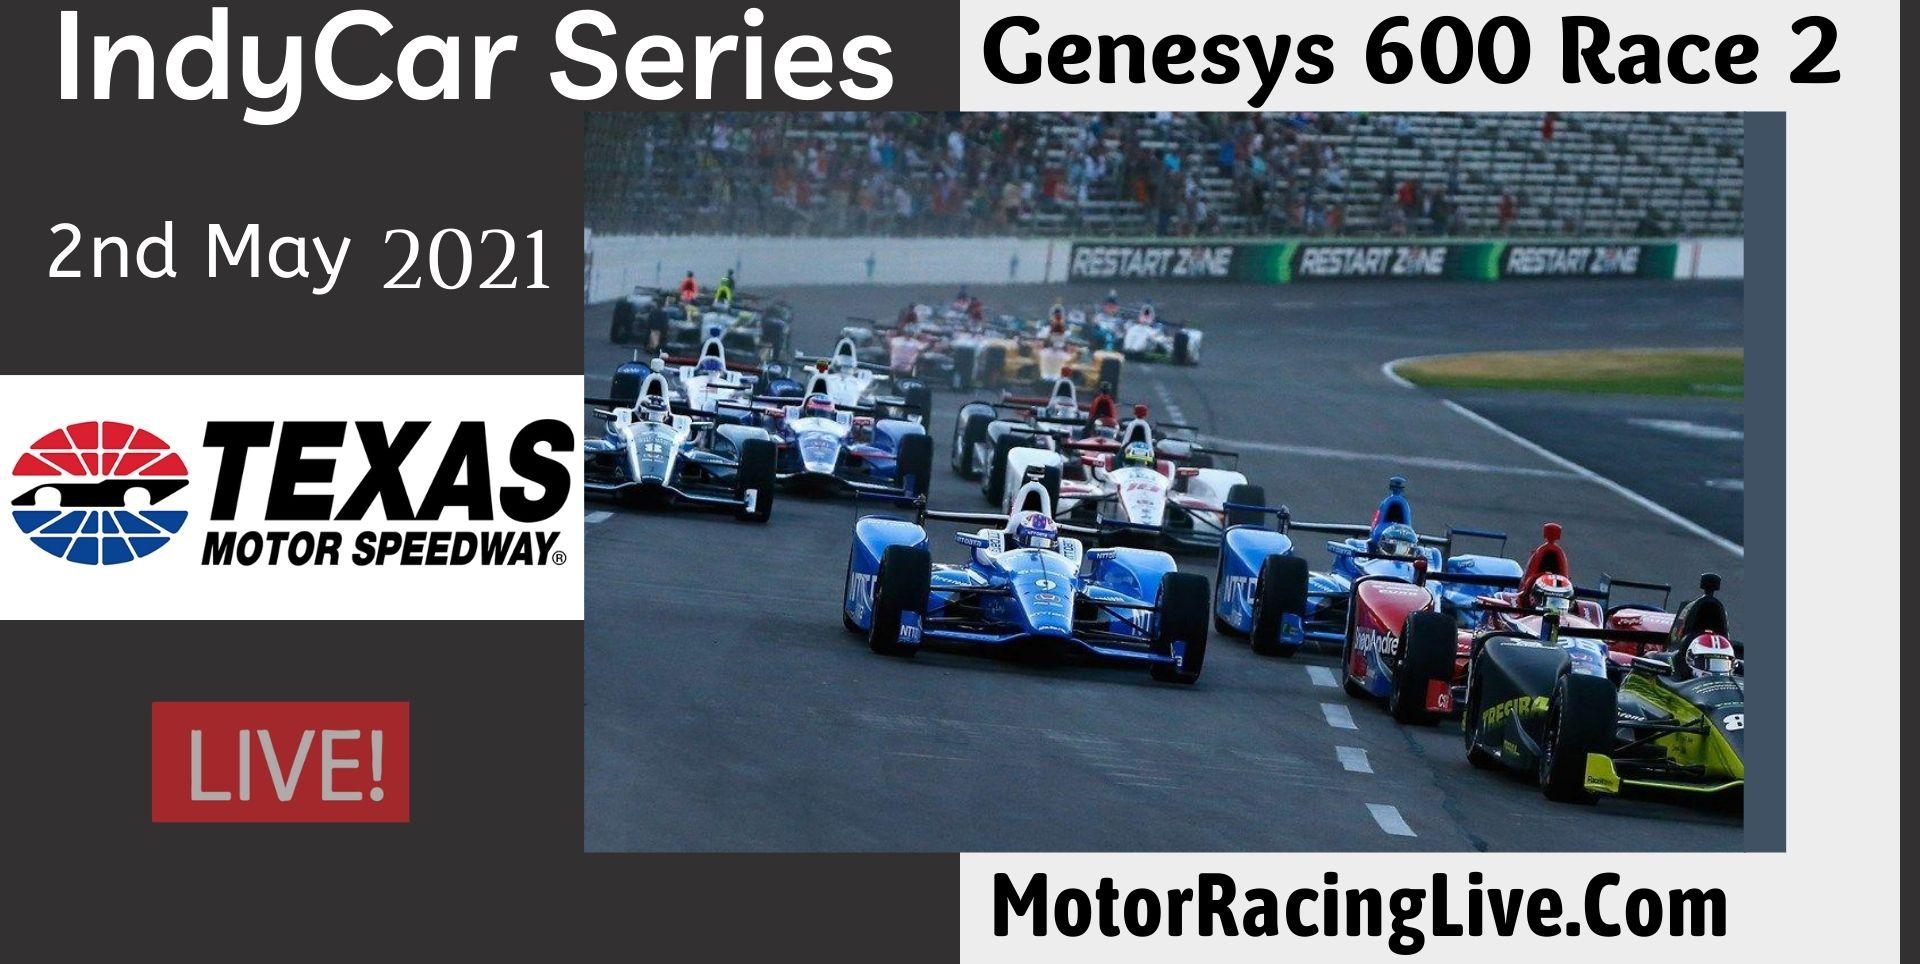 Genesys 600 Race 2 GP Live Stream 2021 | Indycar